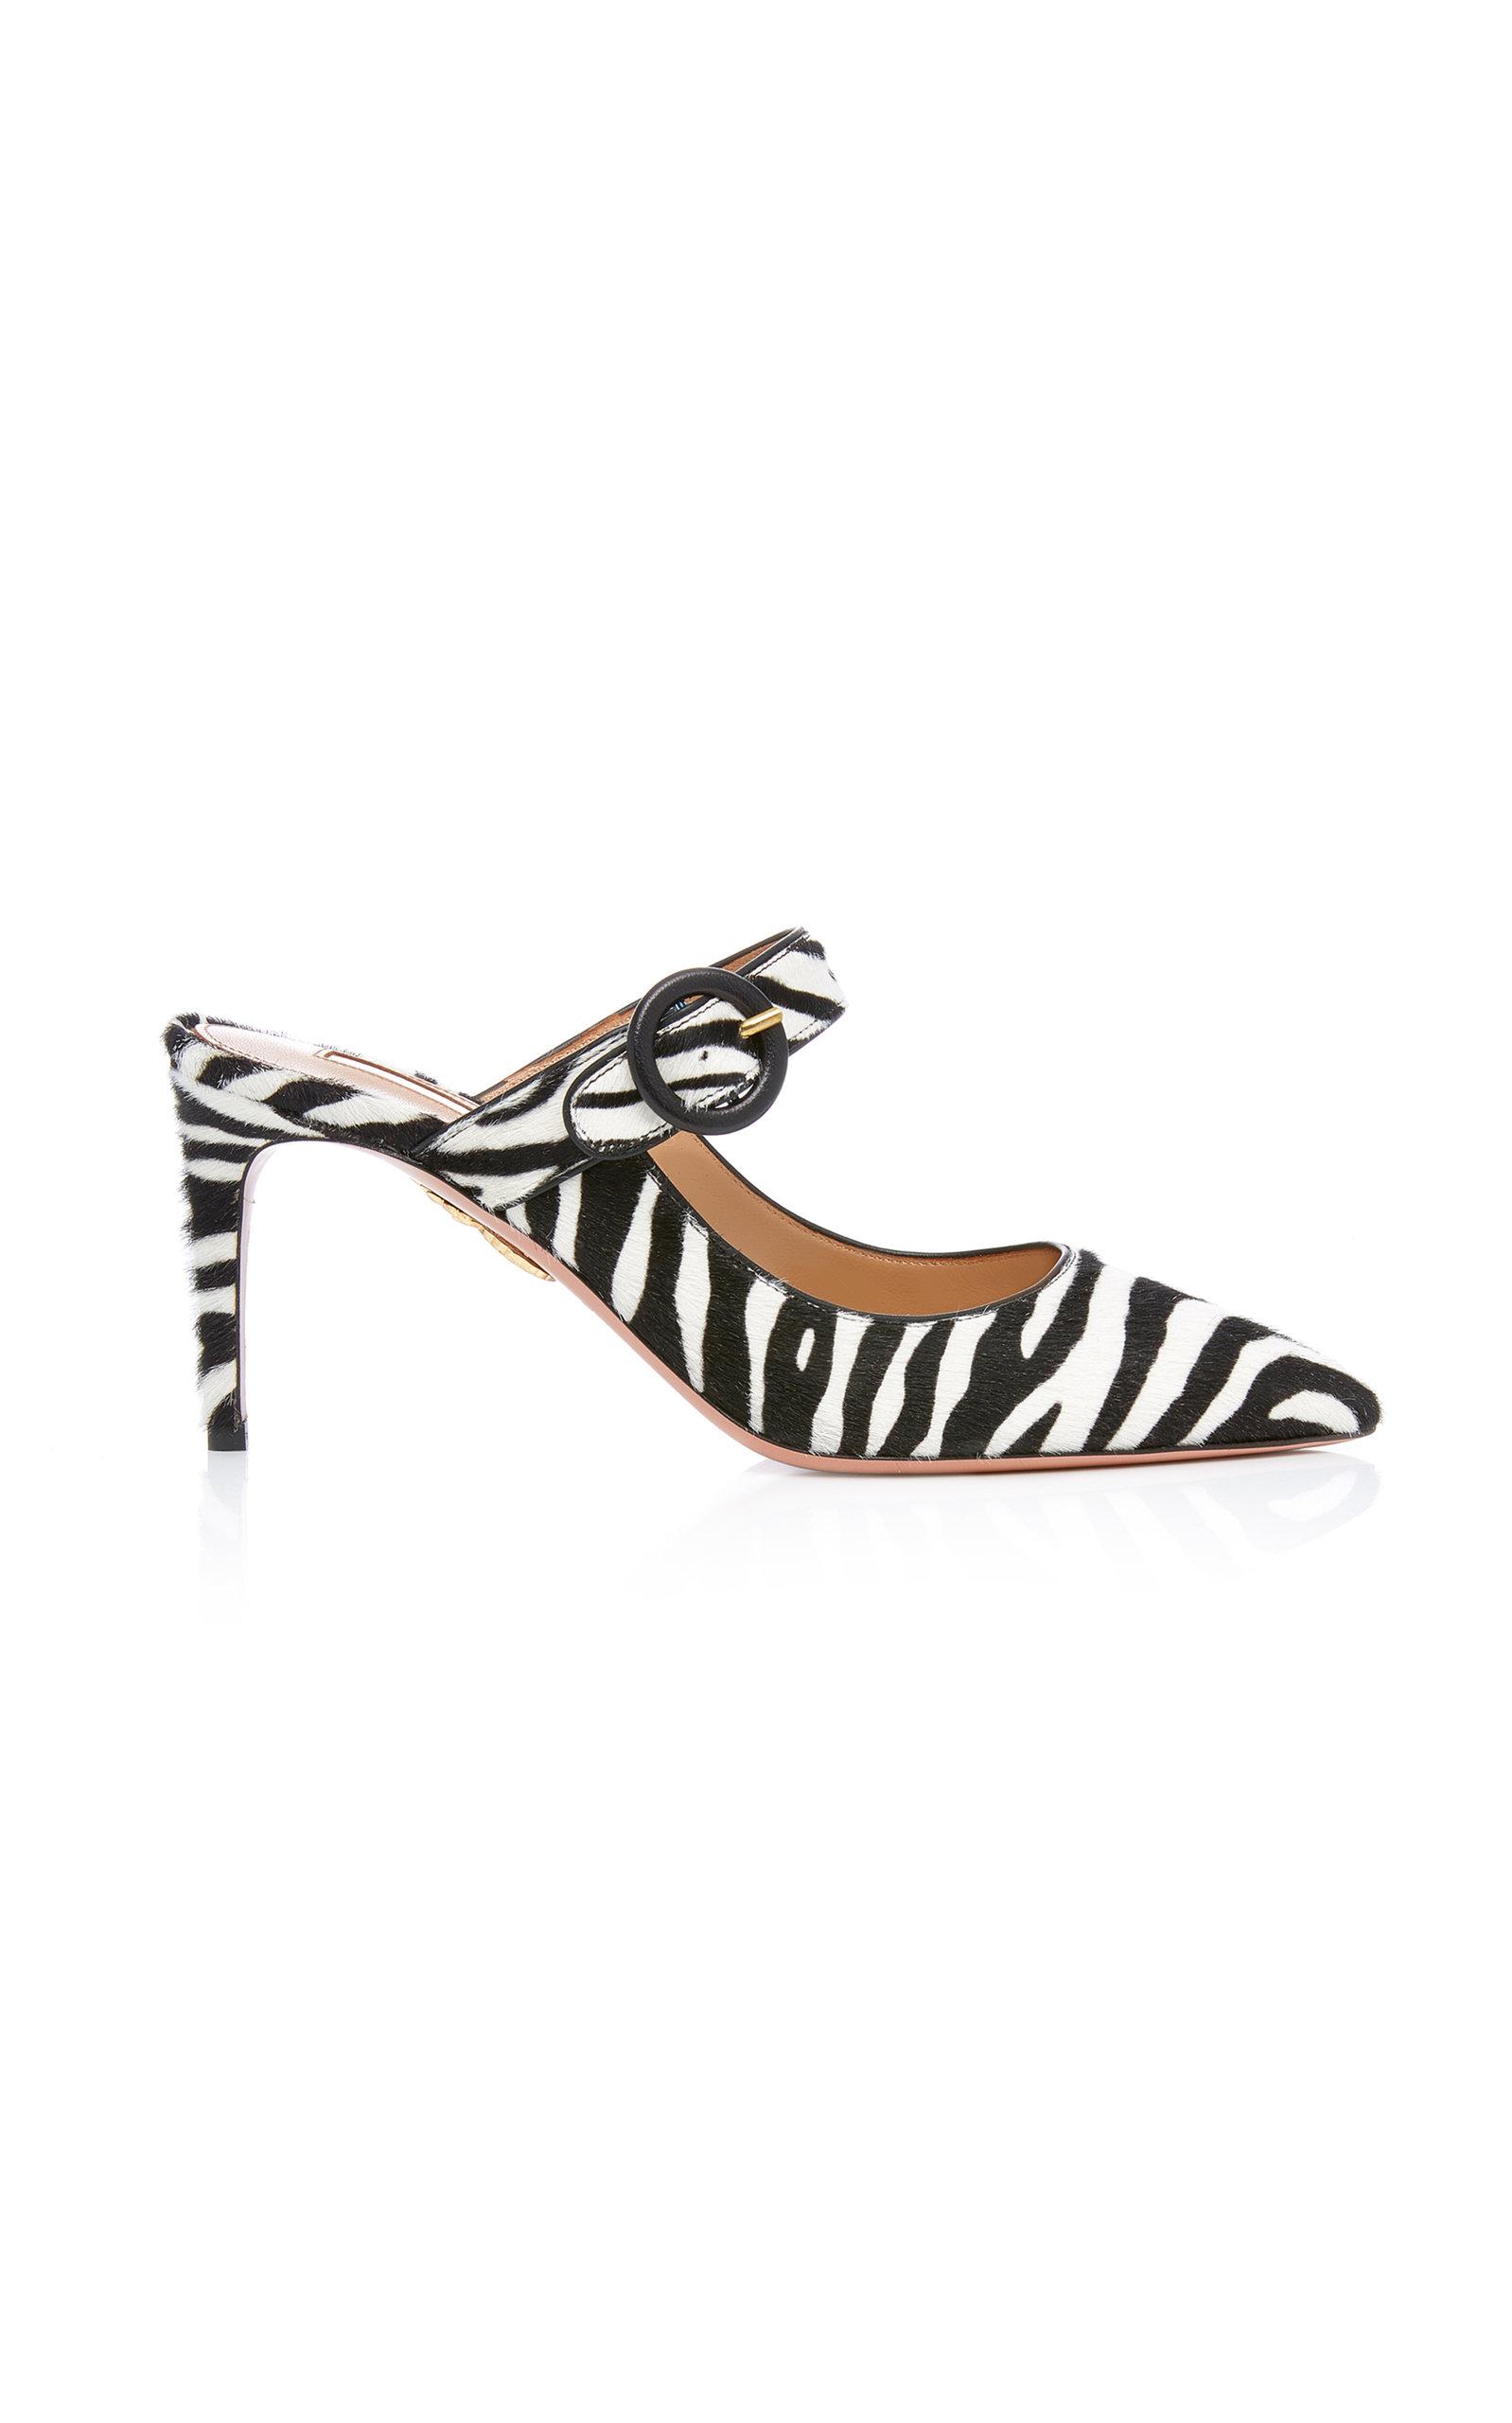 Blossom Zebra-Print Calf Hair Mules in Black